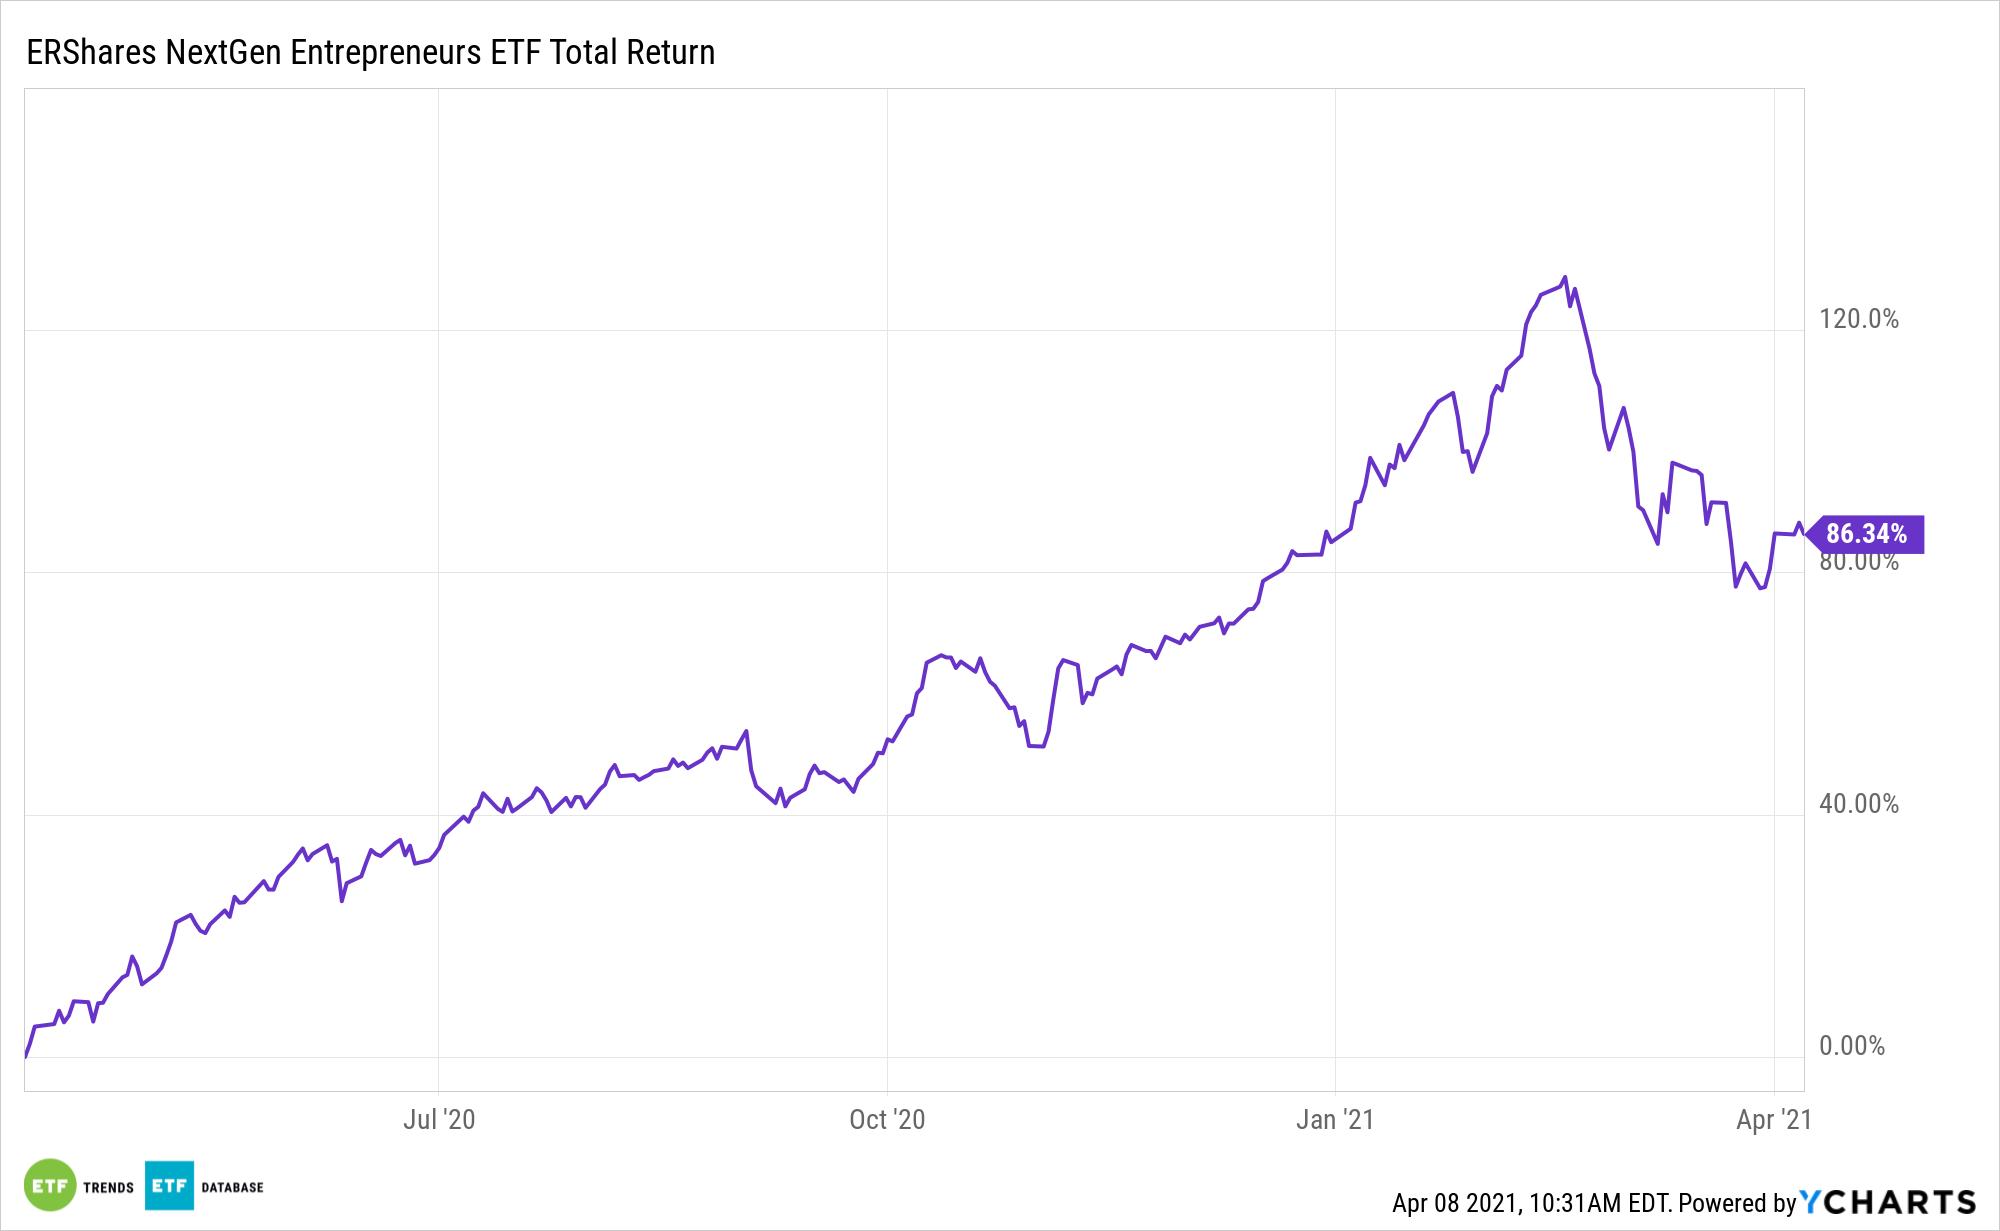 ERSX 1 Year Total Return